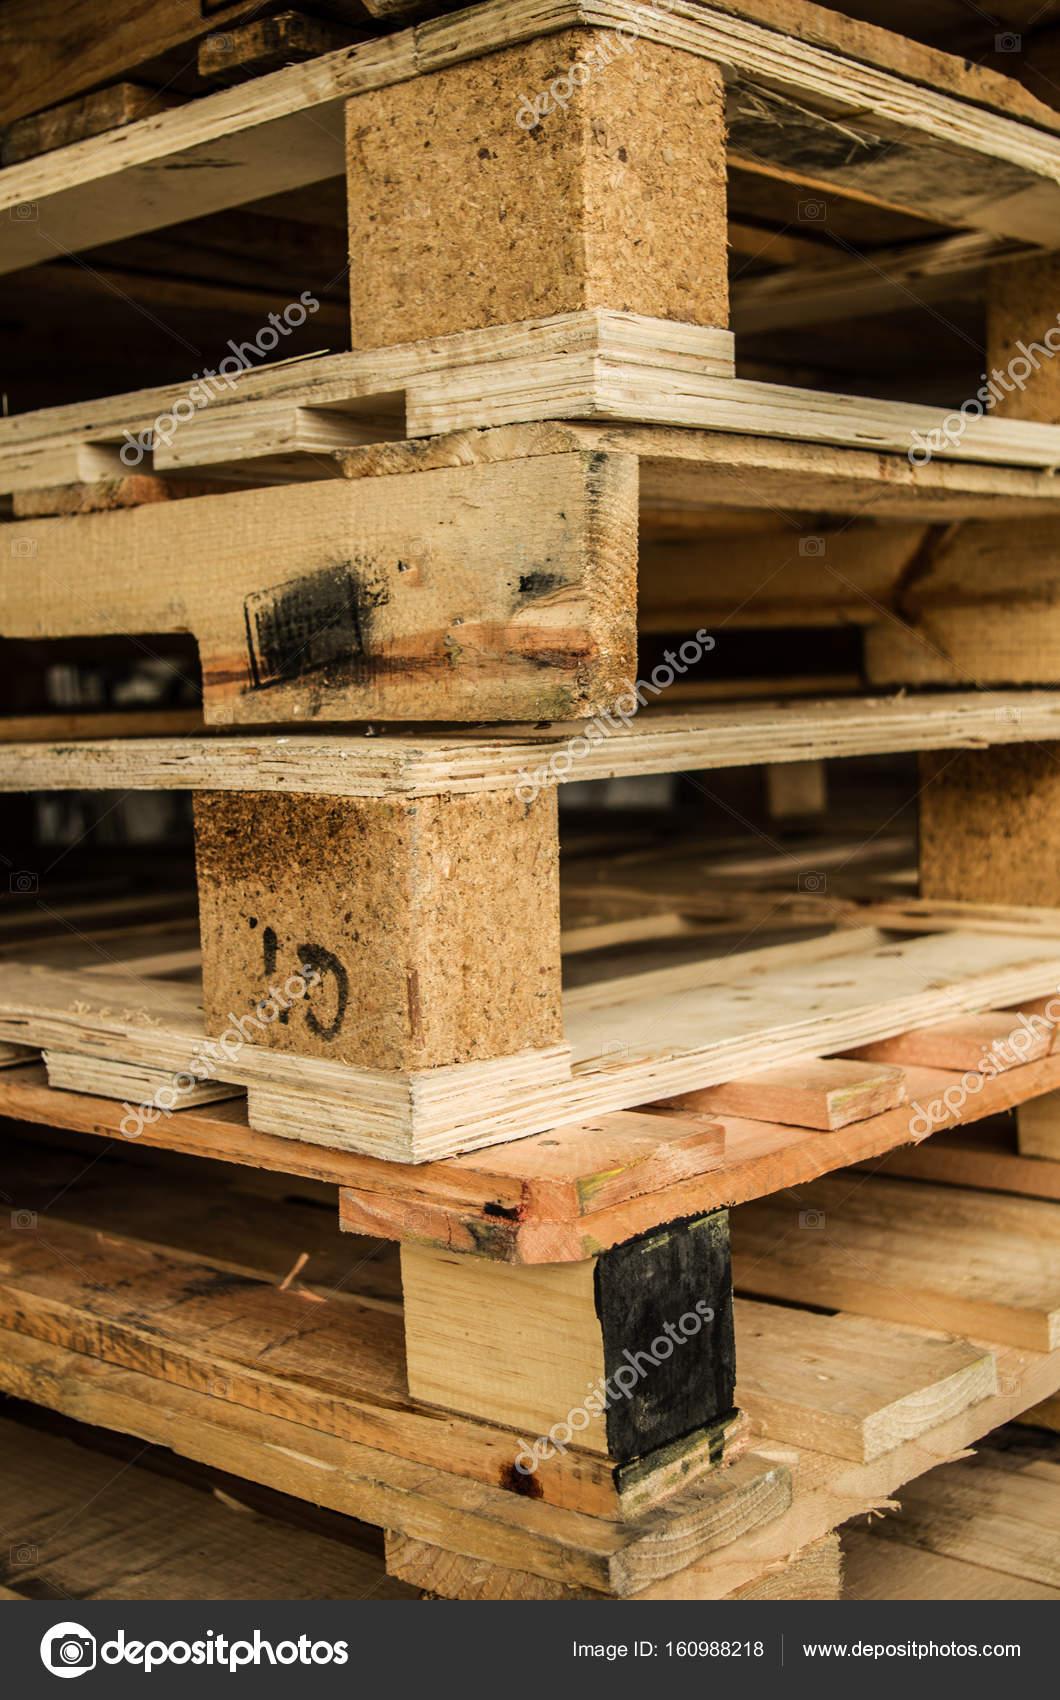 fuera de stock fabricado de madera estndar euro palets almacenados en torres de alta tensin - Europalets